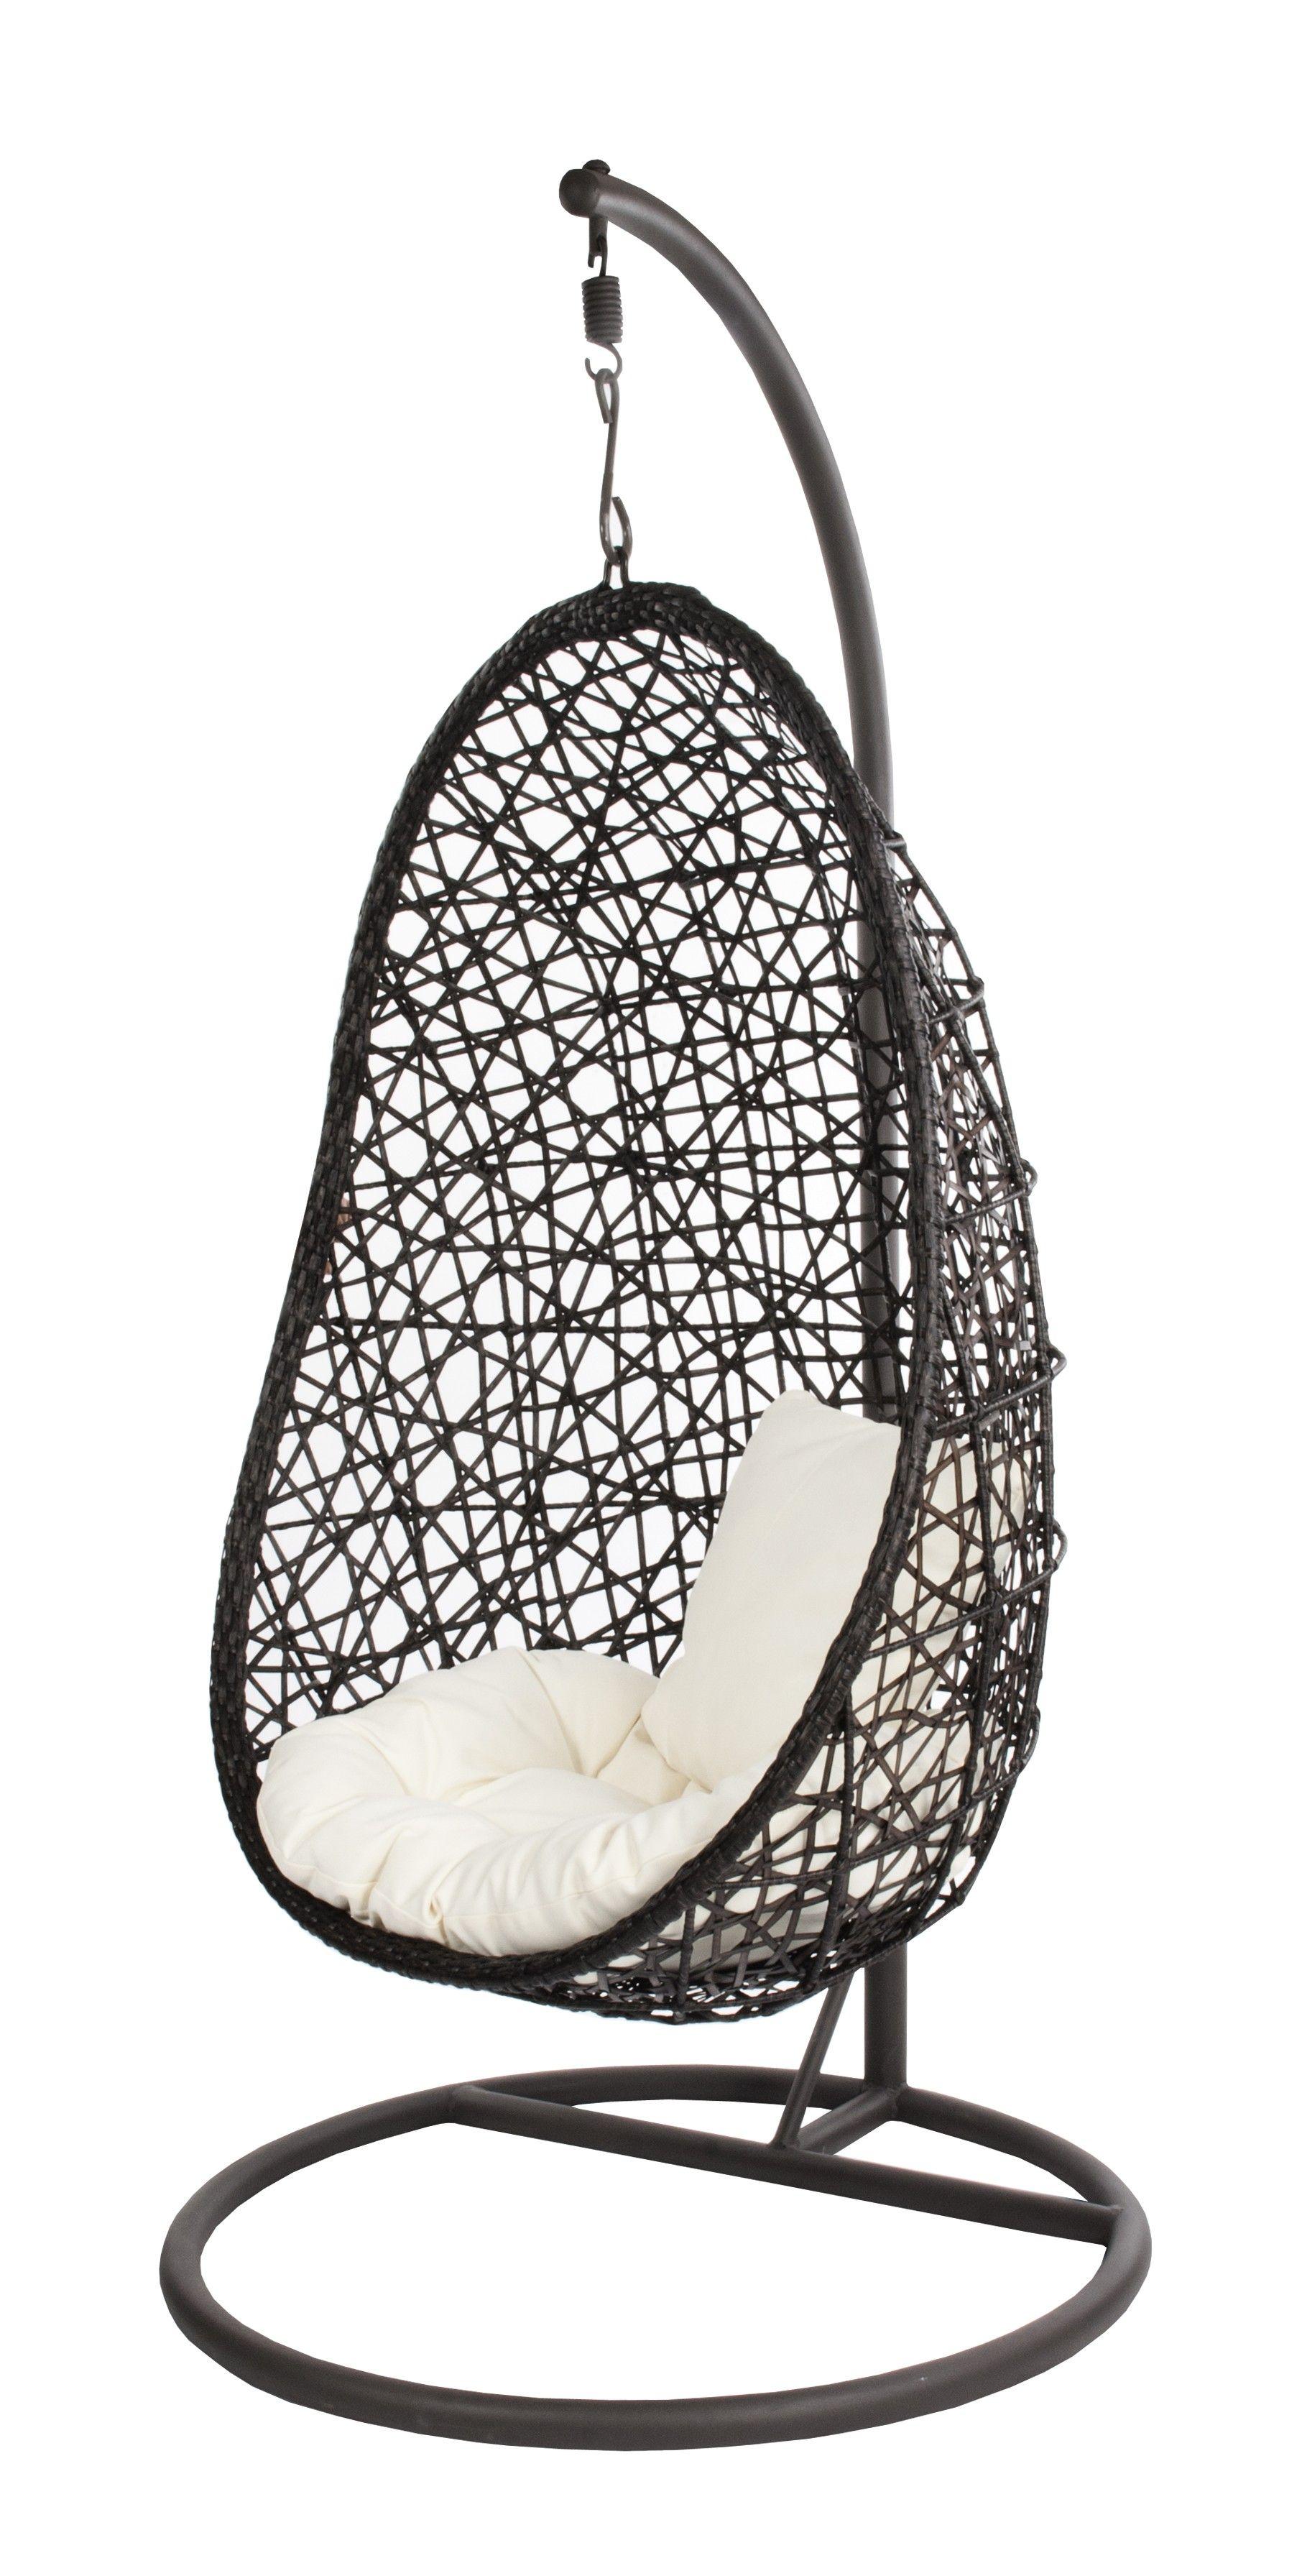 Egg Chair Met Standaard.Schommel Ei Lifs Nl Lifs Interieuradvies Andstyling Mijn Vorige